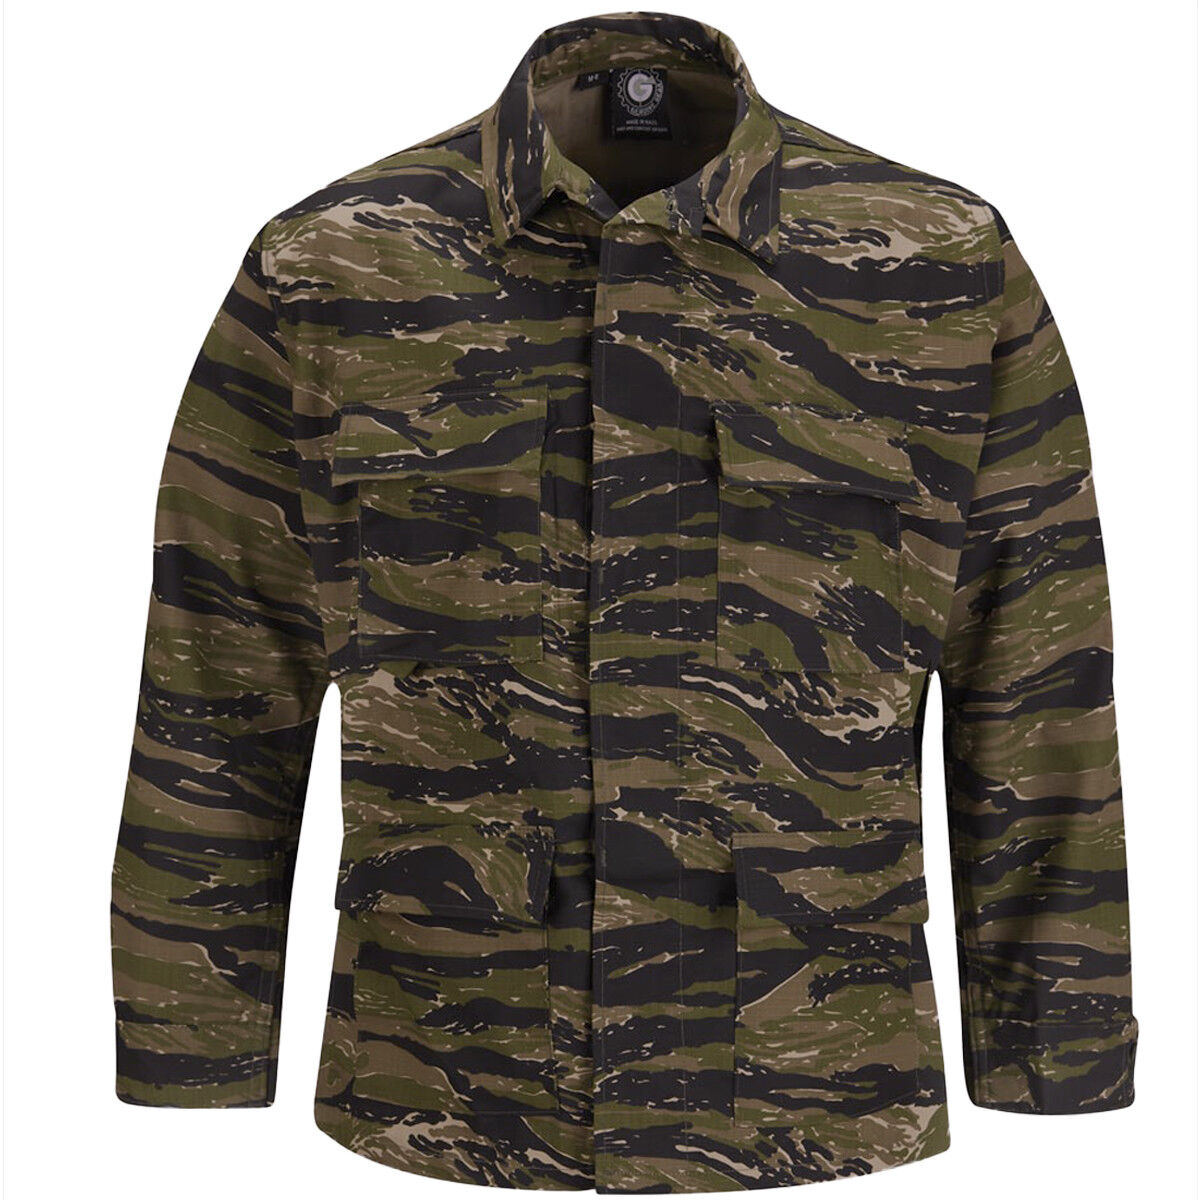 Propper Uniform BDU Coat Mens Military Polycotton Army Asian Tiger Stripe Camo